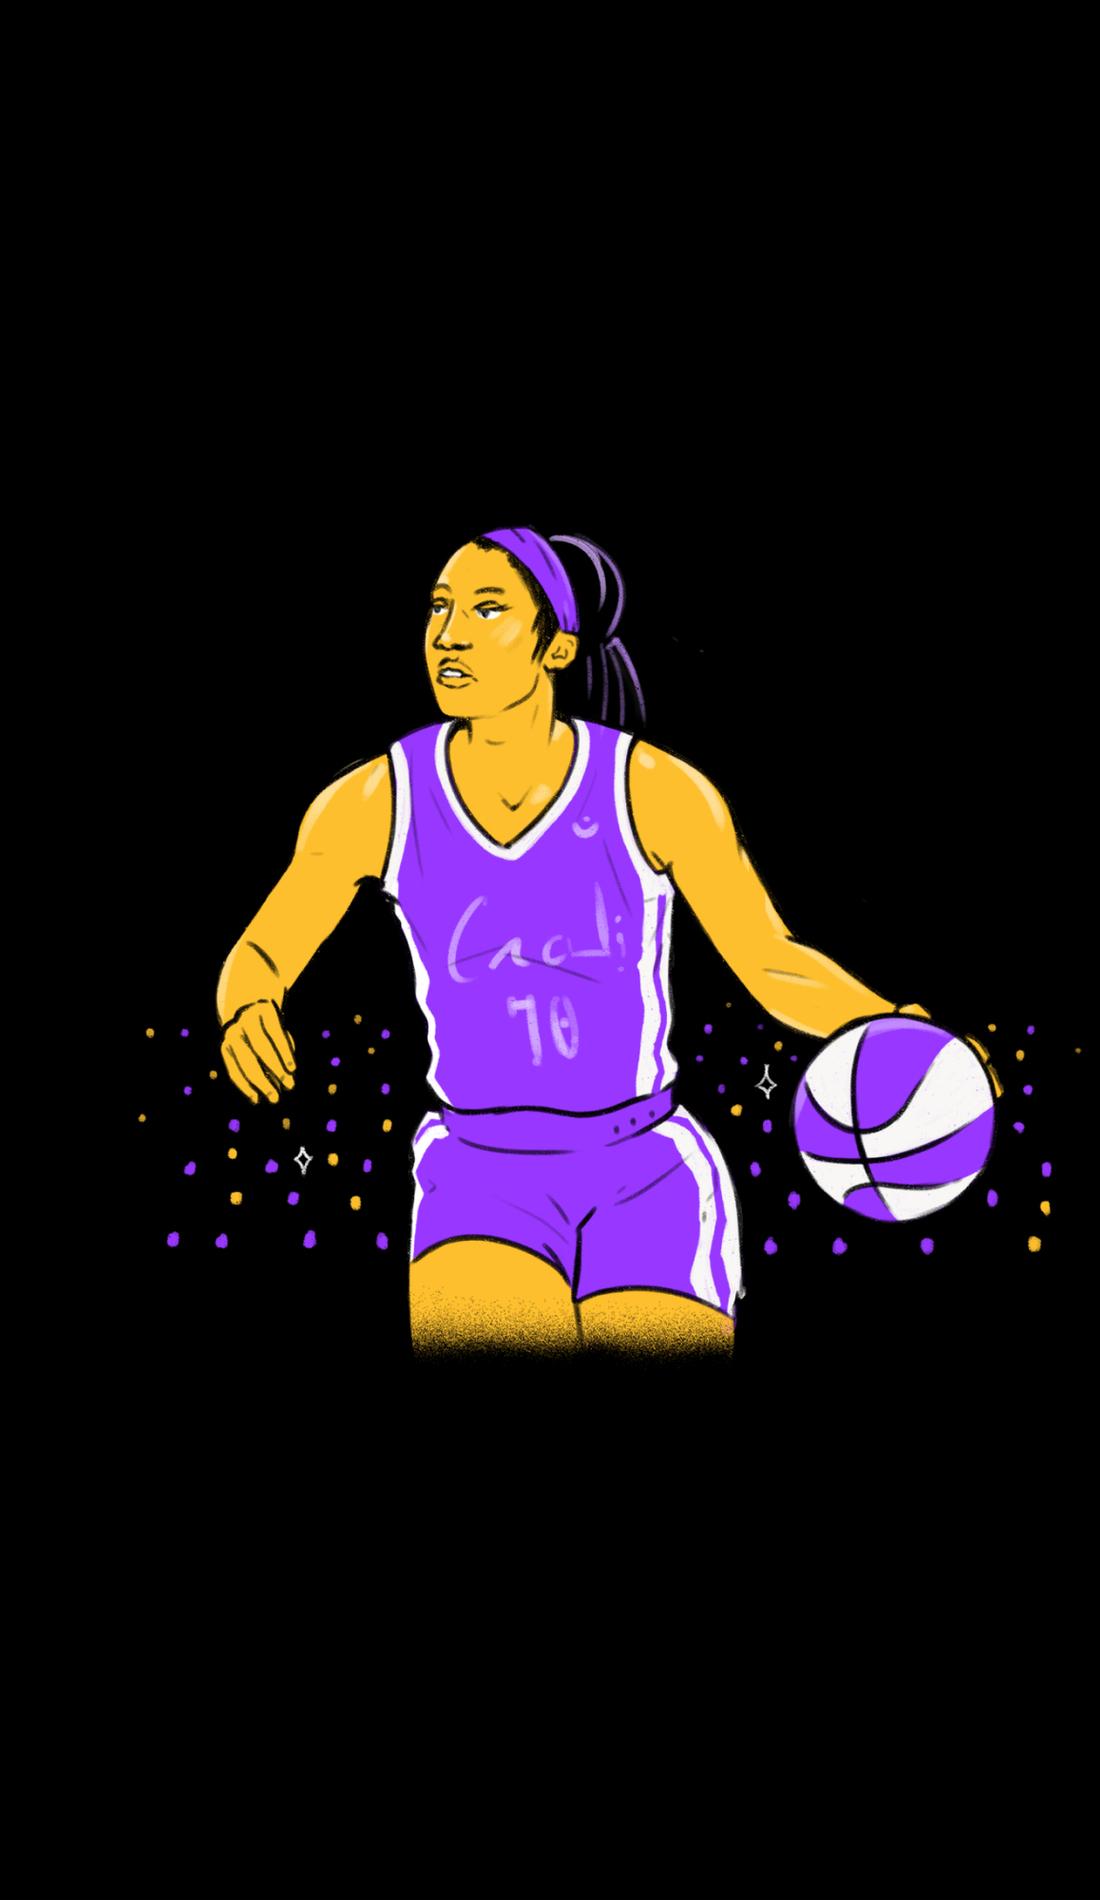 A Utah State Aggies Womens Basketball live event